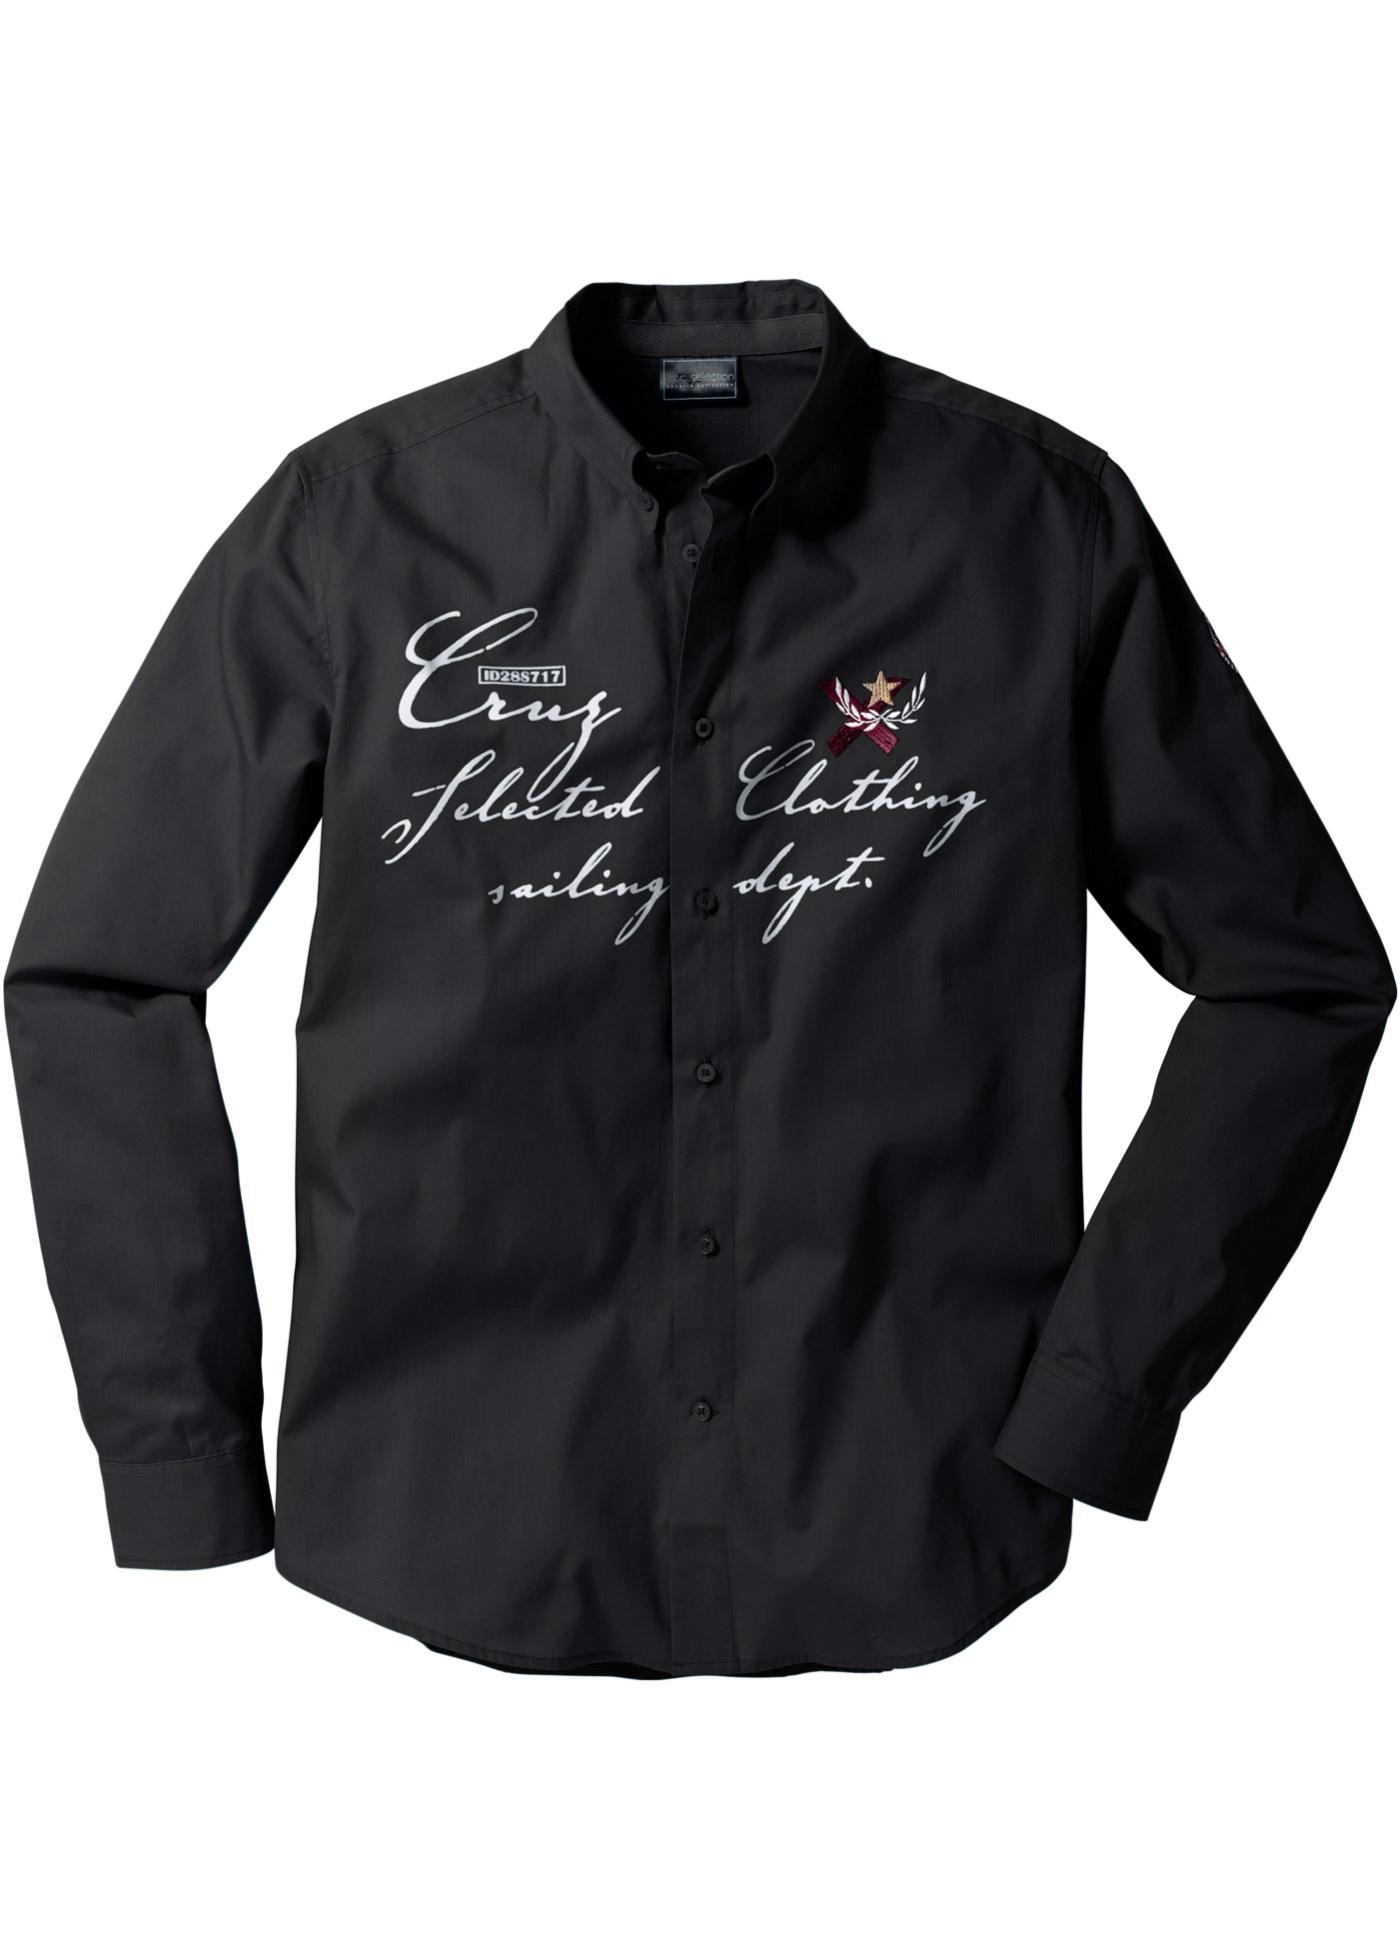 bpc selection Hemd langarm in schwarz für Herren von bonprix Herrenmode Herrenbekleidung Herren Hemden Herren Hemd Langarm